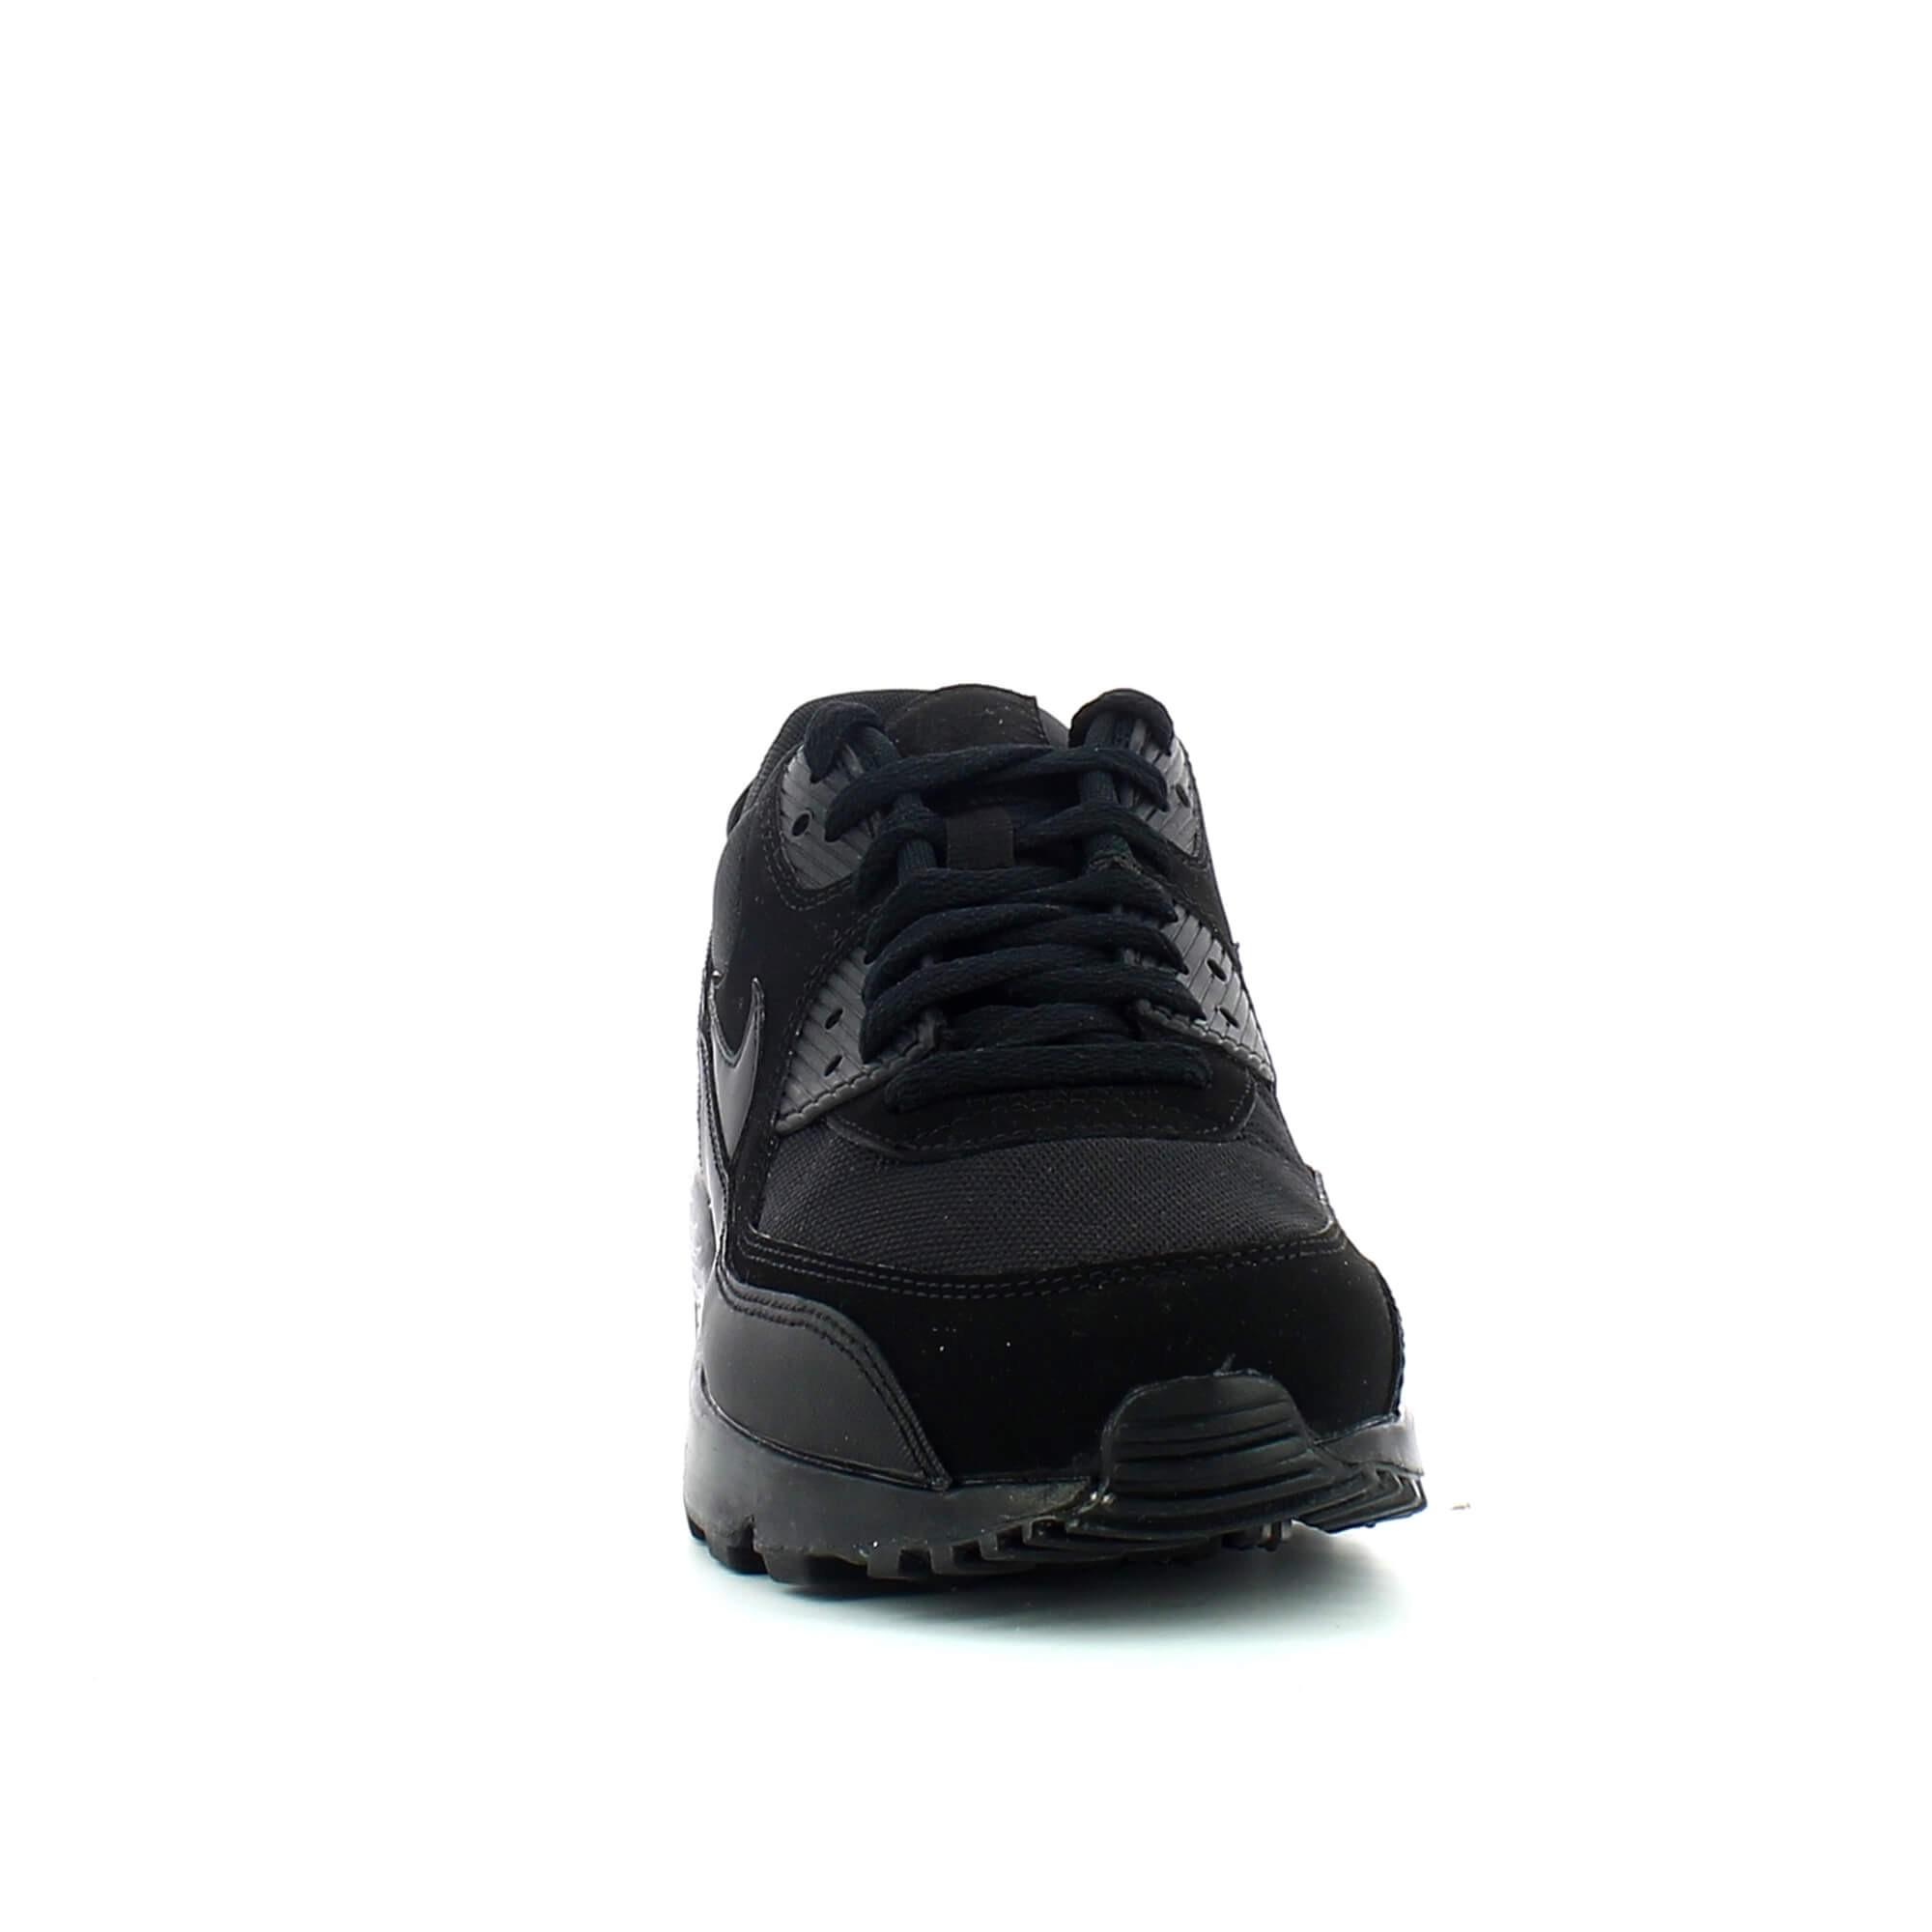 Hombre Nike Air Max 90 Essential Zapatillas 537384 090 Negro